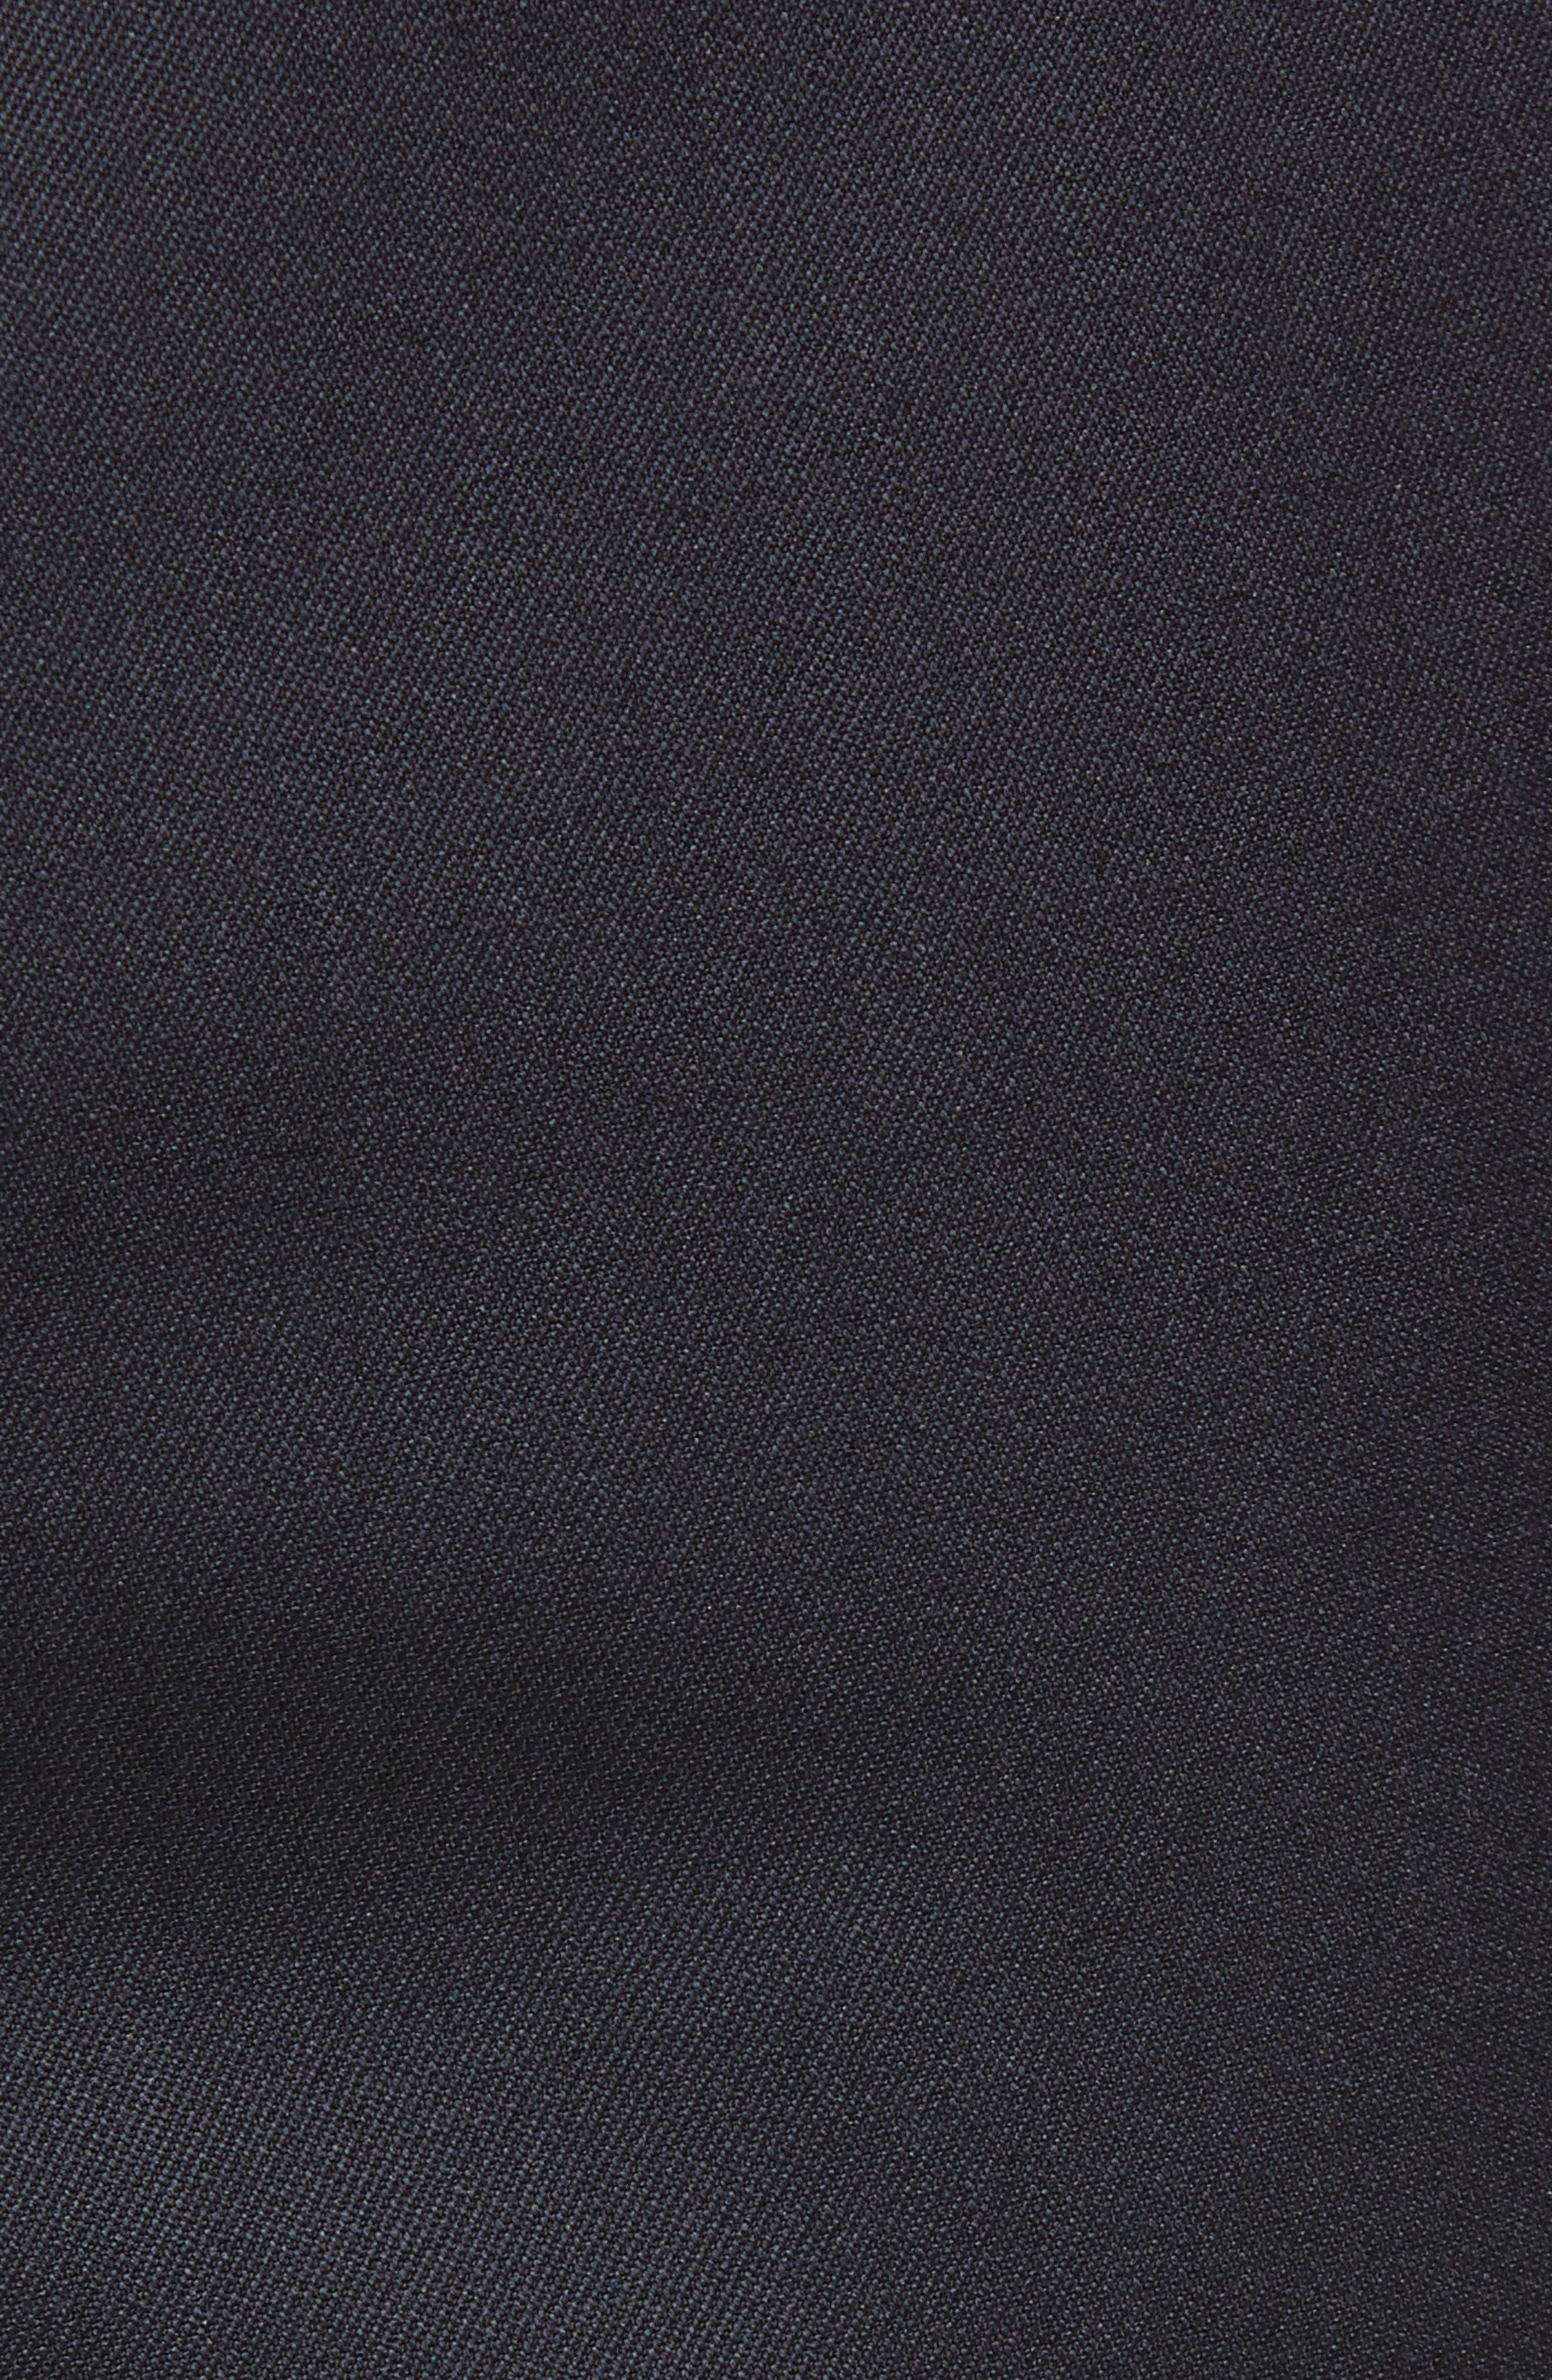 Torino Flat Front Wool Gabardine Trousers,                             Alternate thumbnail 29, color,